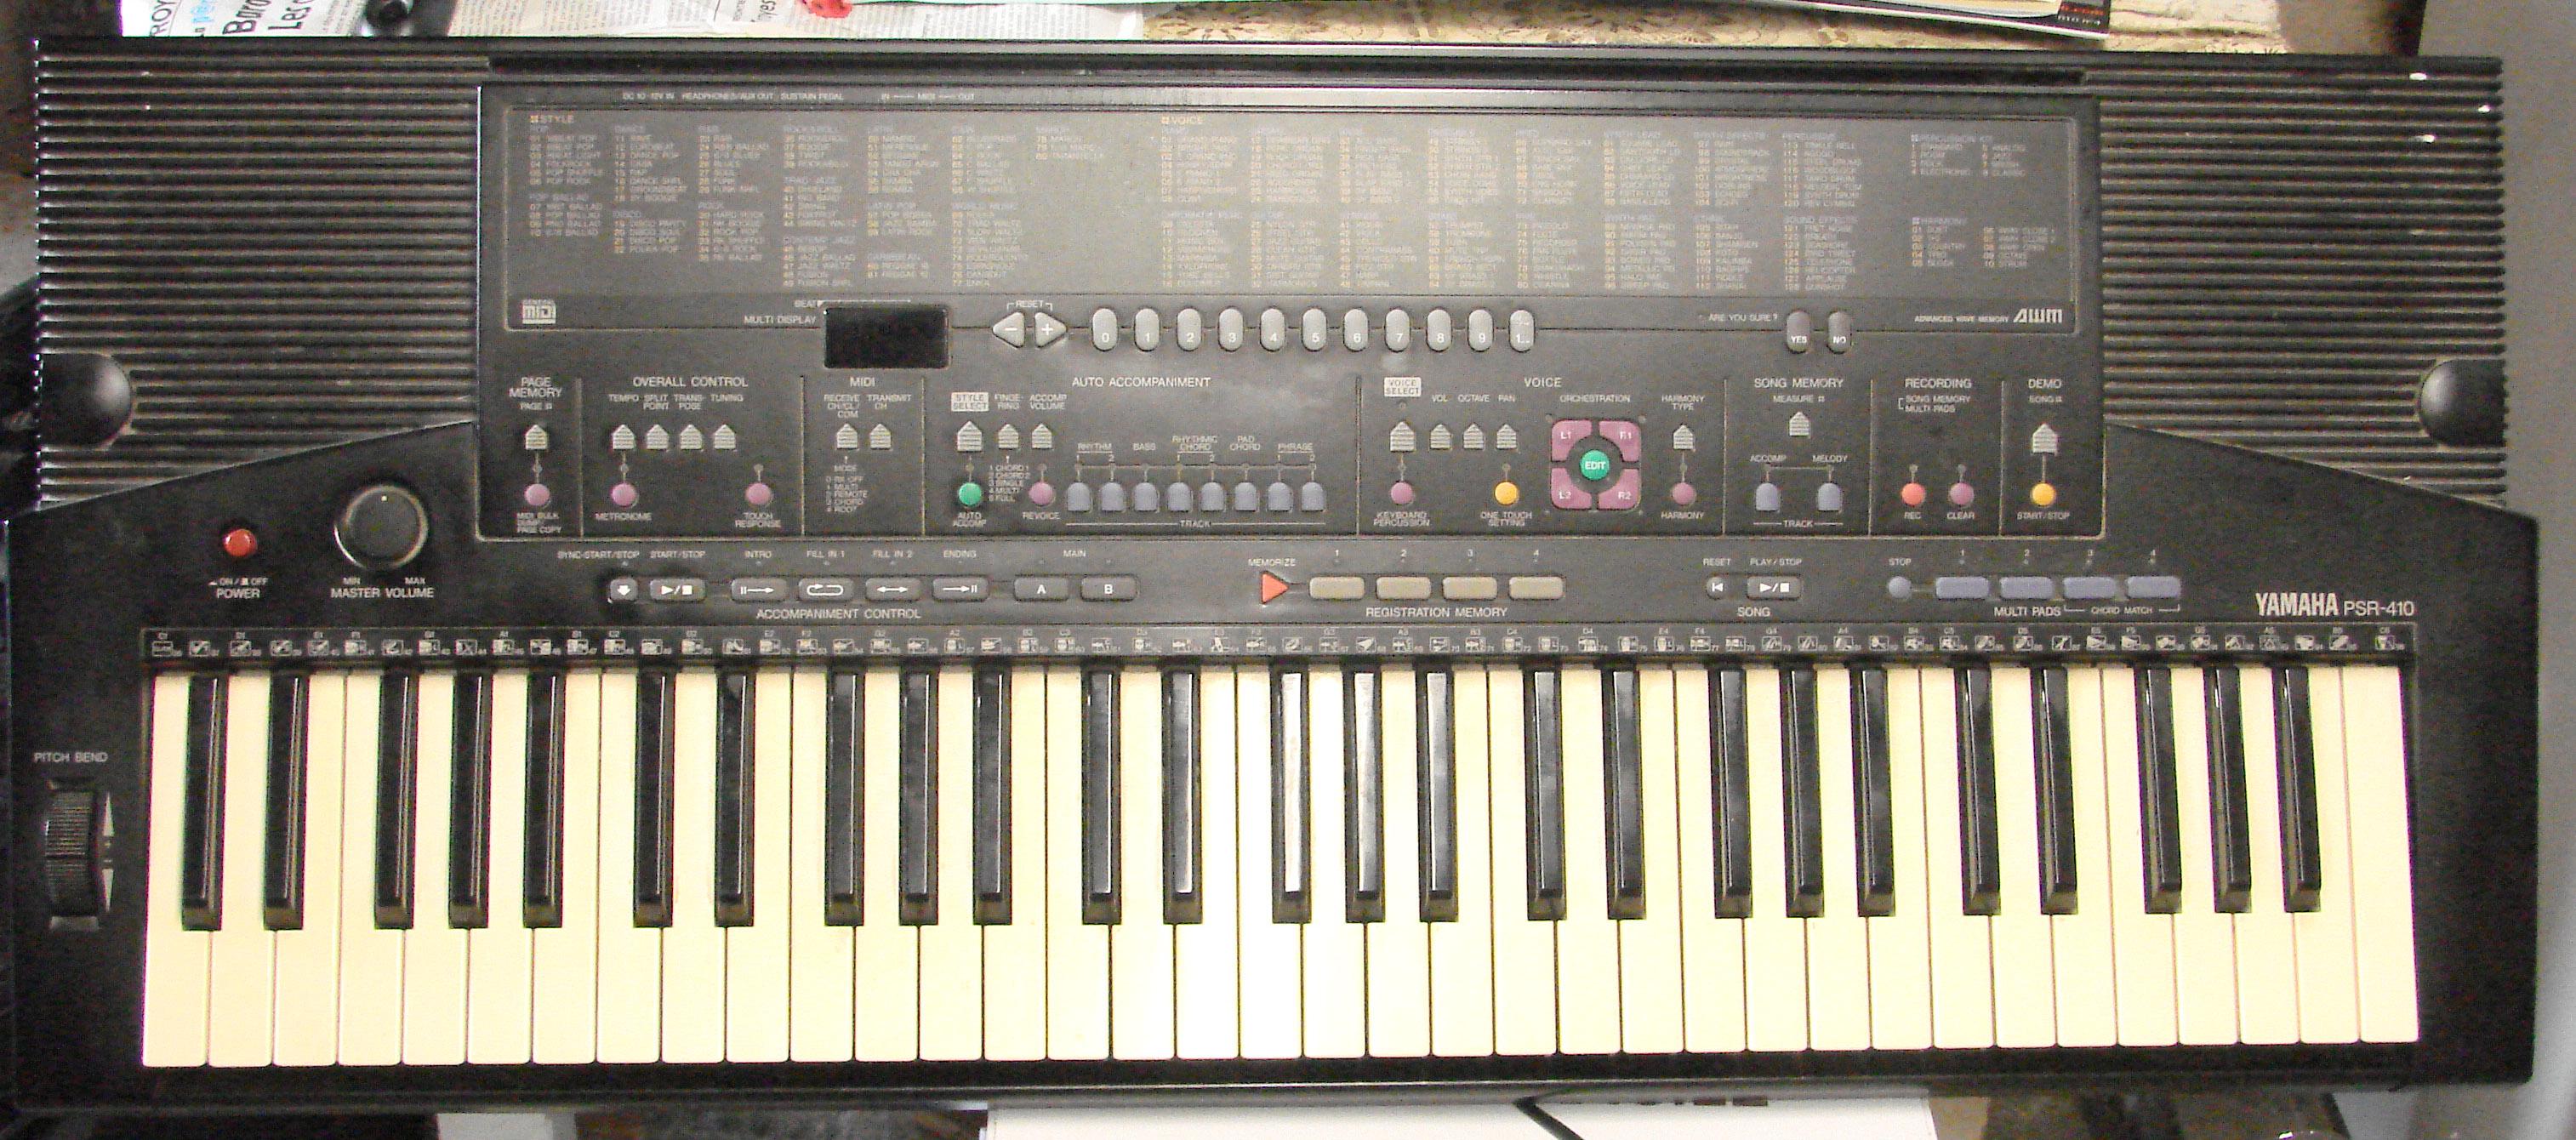 Yamaha psr 410 image 1138083 audiofanzine for Yamaha psr 410 keyboard